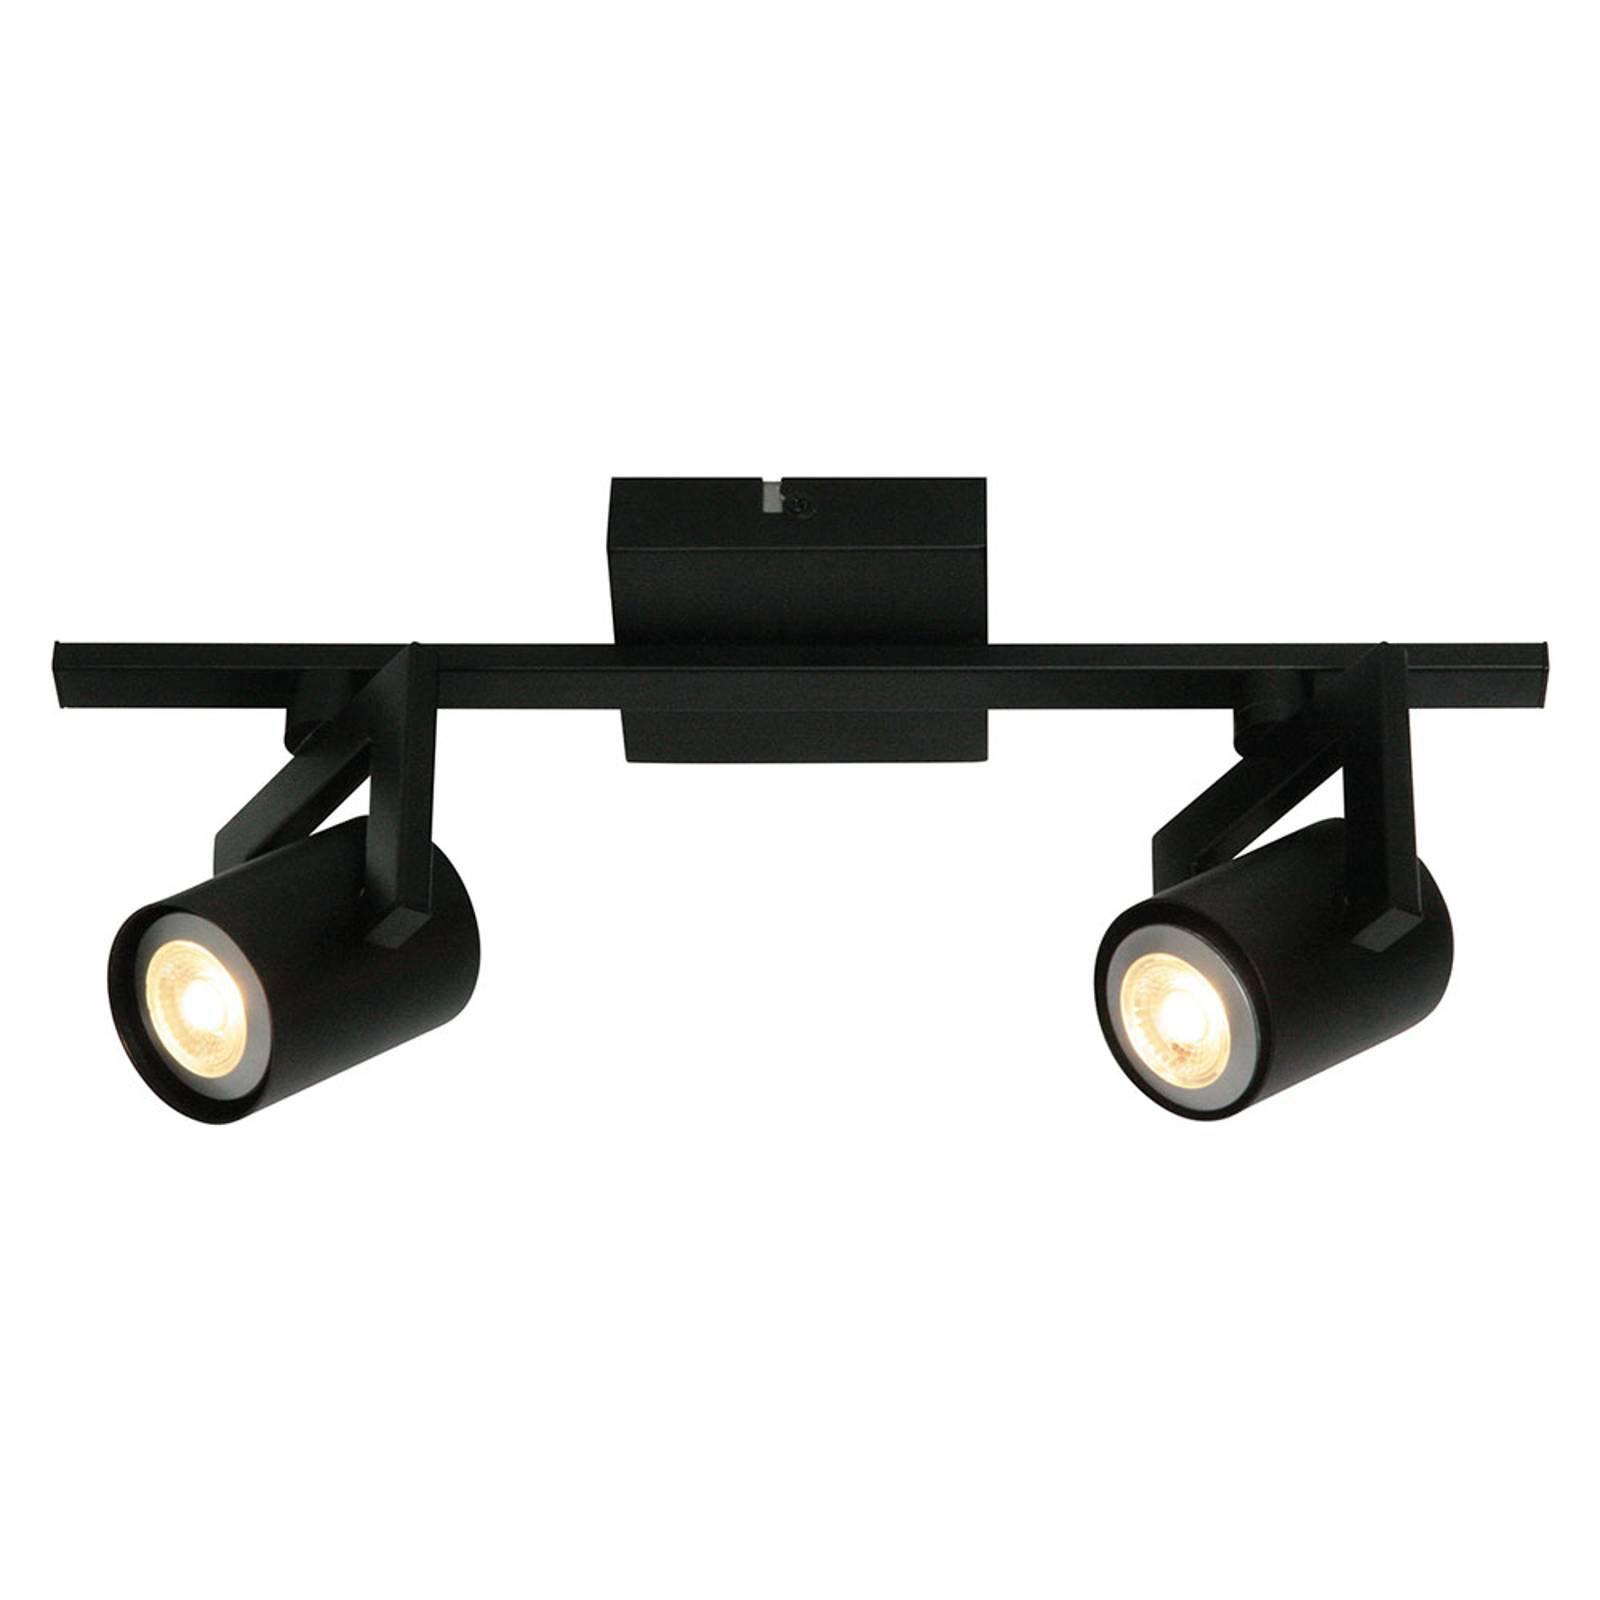 Moderne taklampe ValvoLED i svart 2 lyskilder